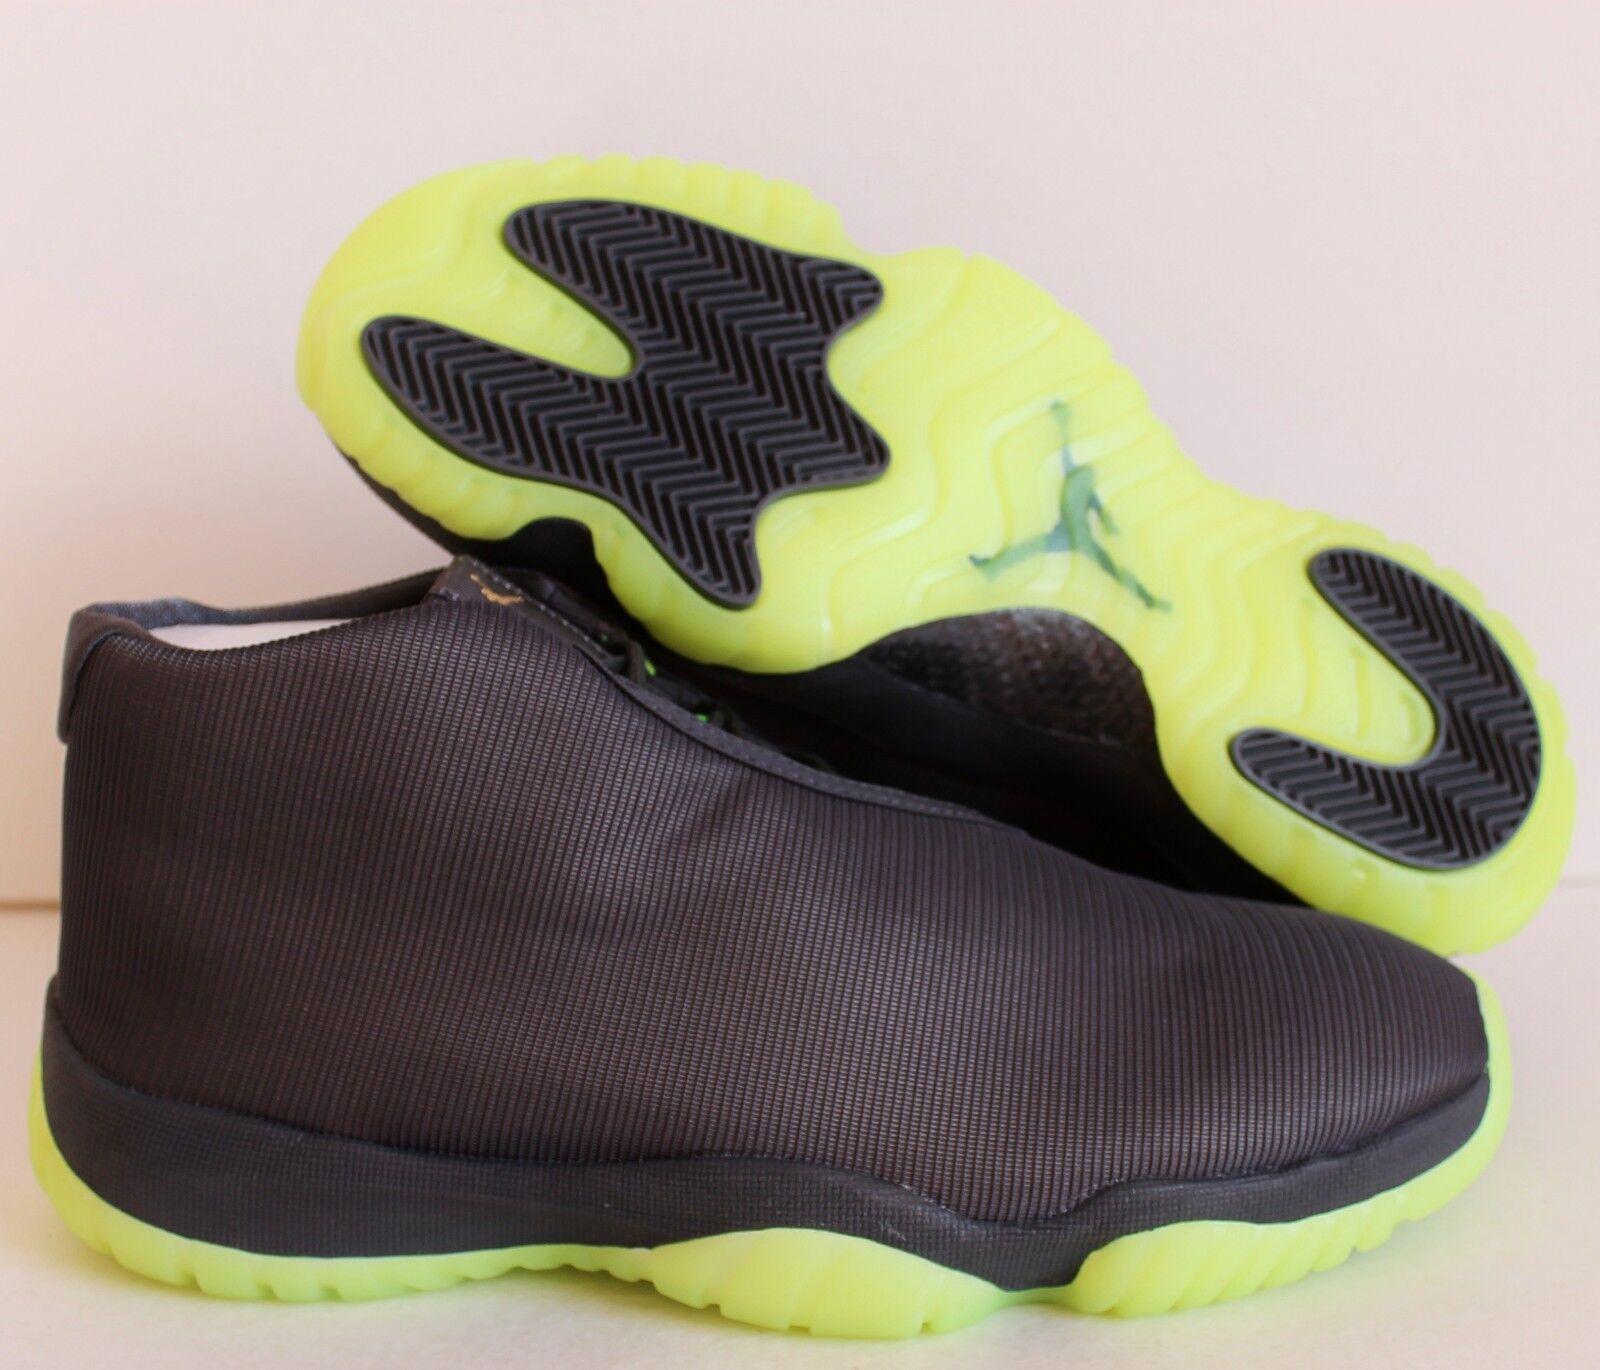 NIKE AIR JORDAN FUTURE FOOTSCAPE DARK GREY-VOLT SZ 12 [656503-025]